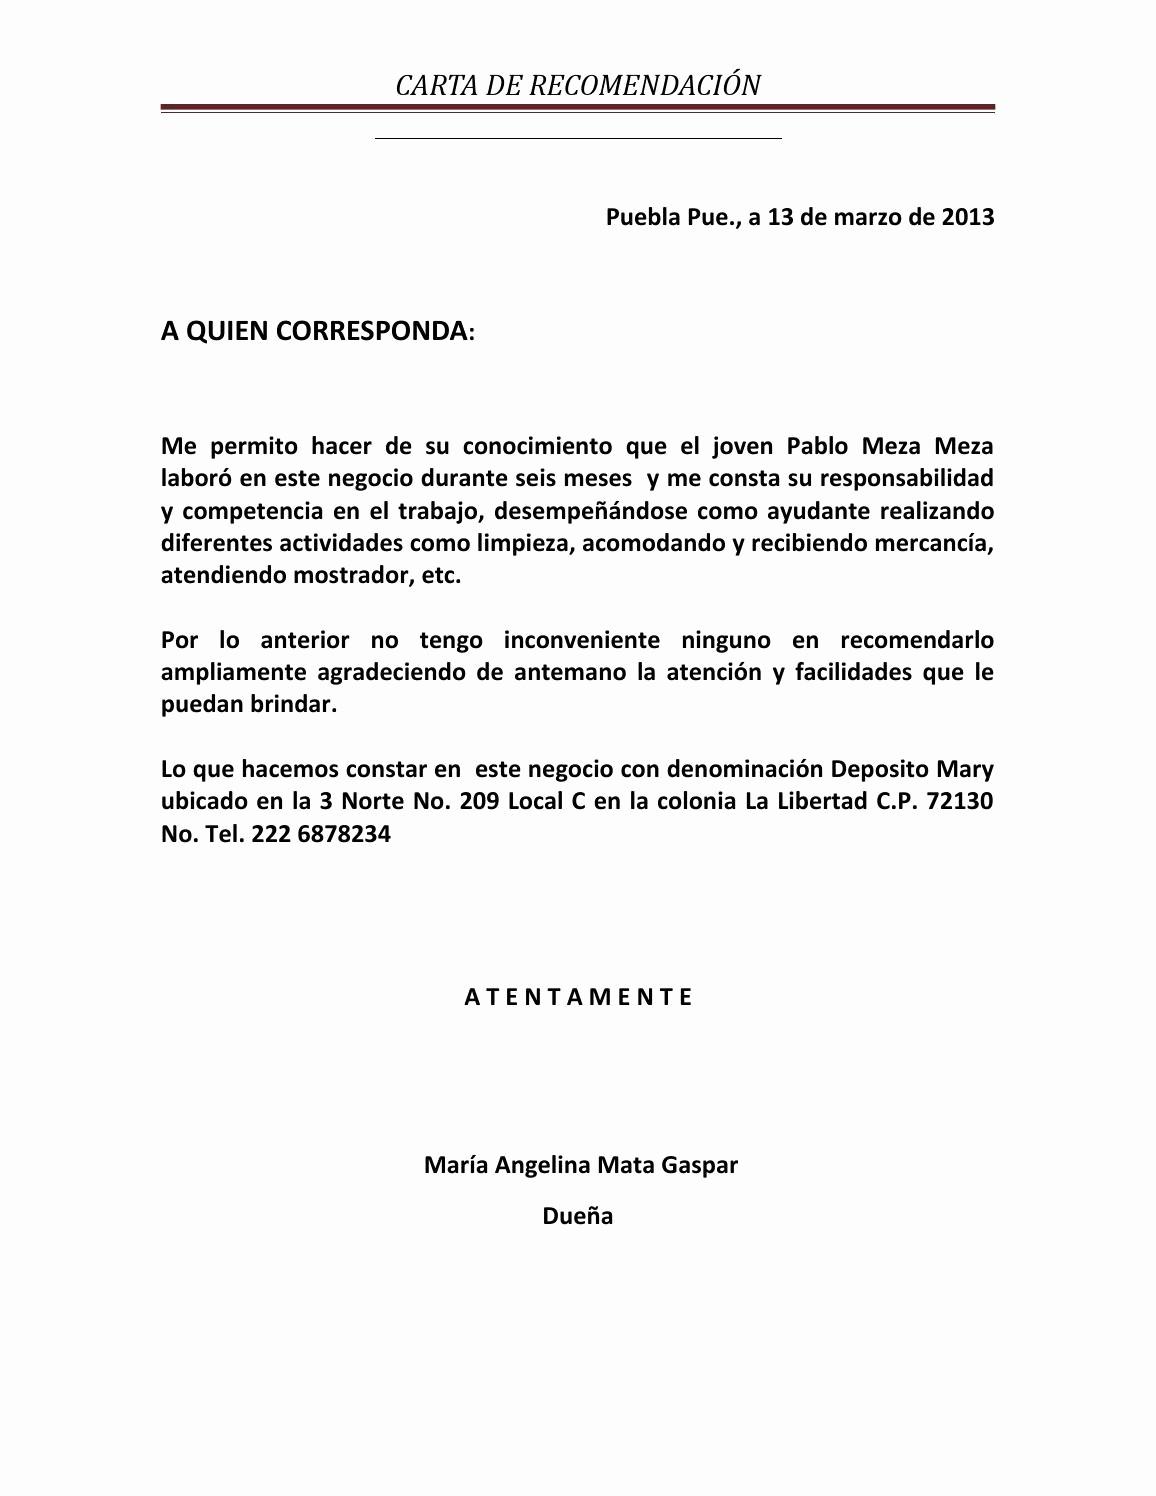 Formato Carta De Recomendacion Personal Elegant Carta Re Endacion Pablom by Hilario issuu